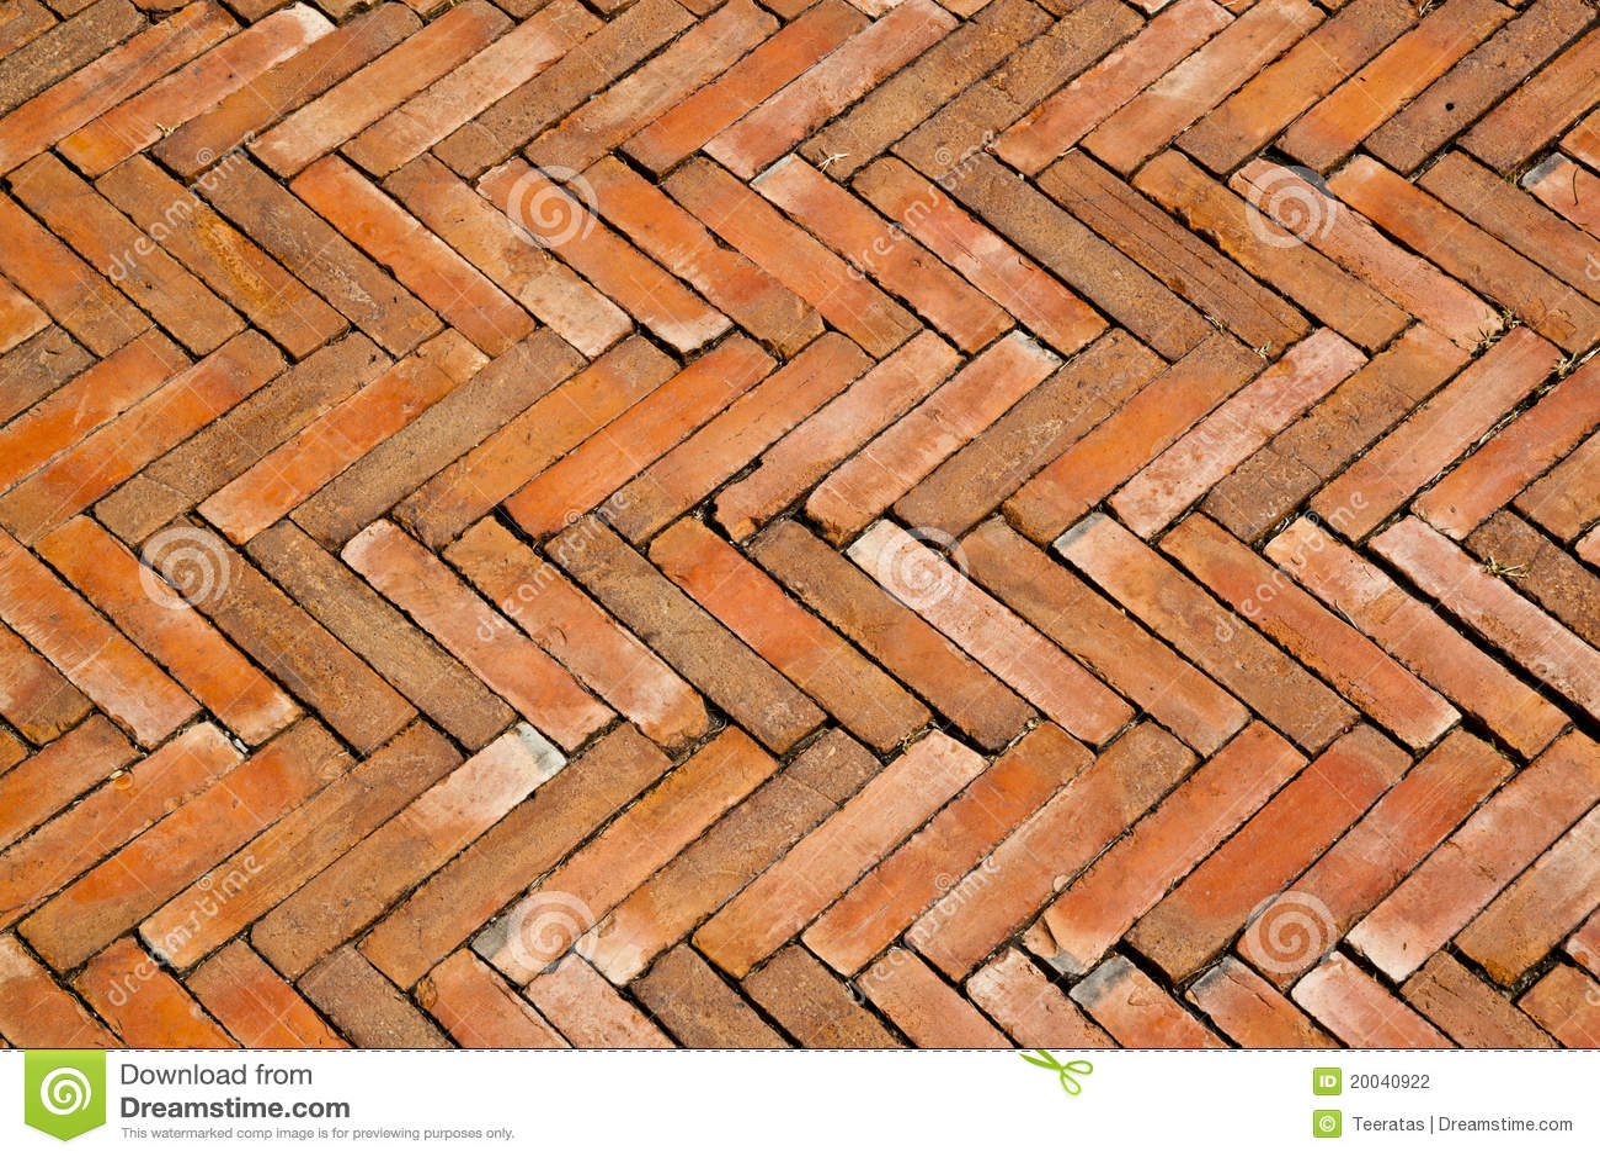 Z Brick Flooring : Tile bricks floor stock photography image